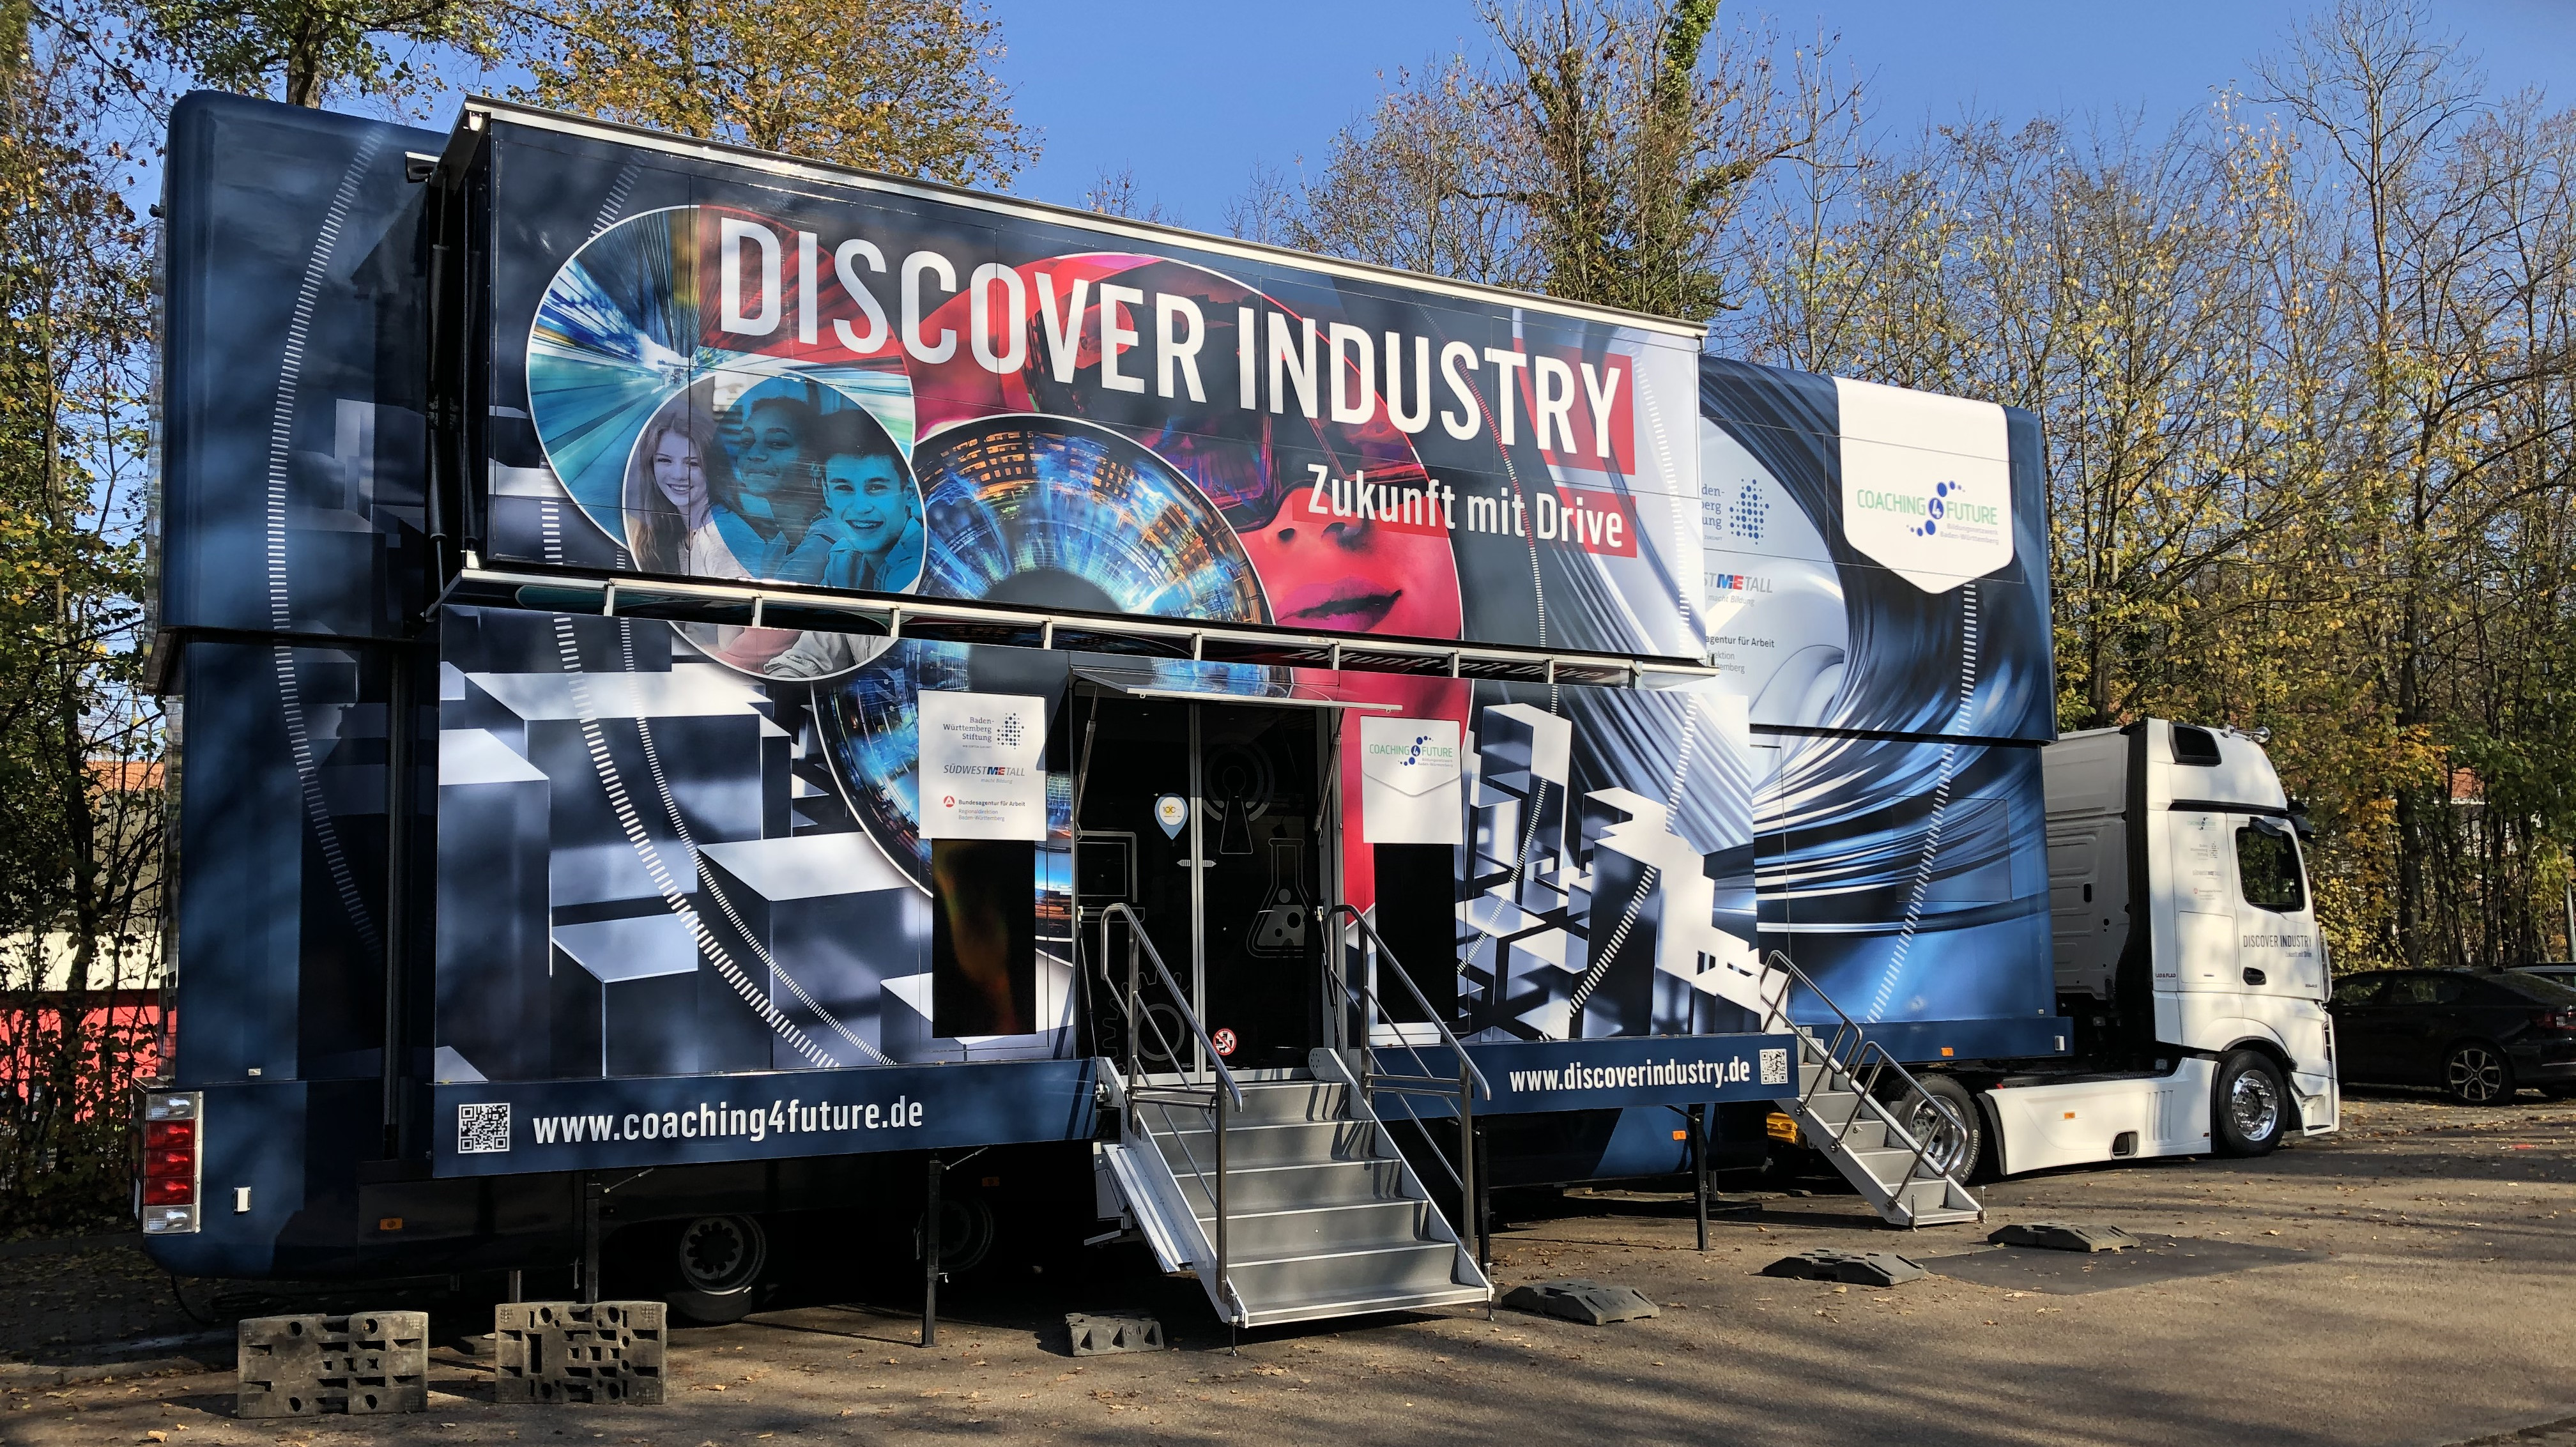 Der Discover Industry Truck an der Glemstalschule.